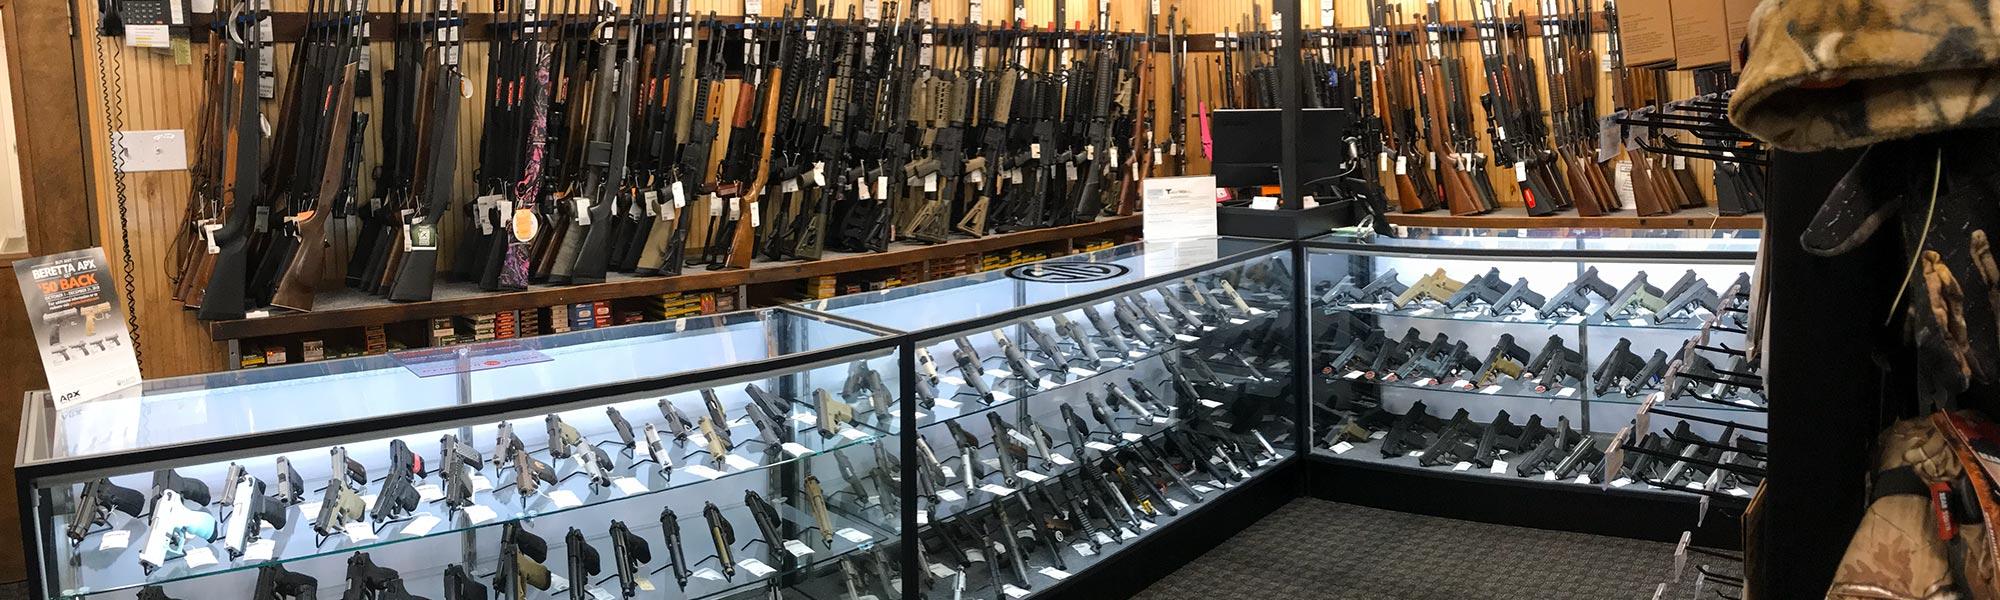 Gun sales at Target World in Chalfont, PA